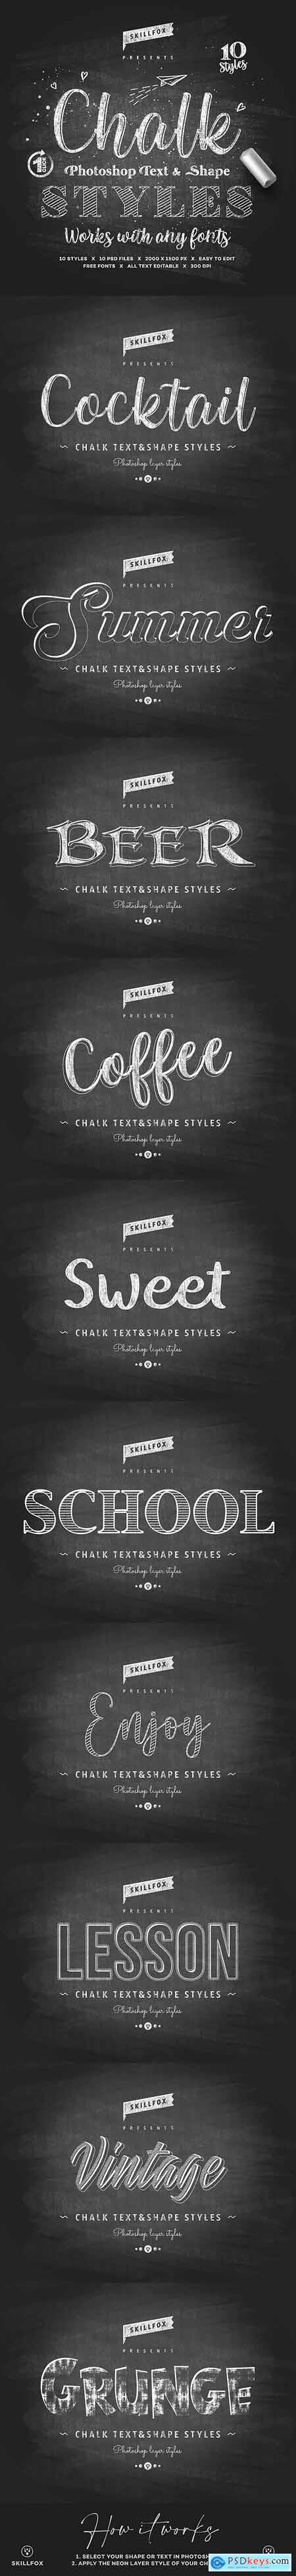 Chalk Photoshop Styles 26441132